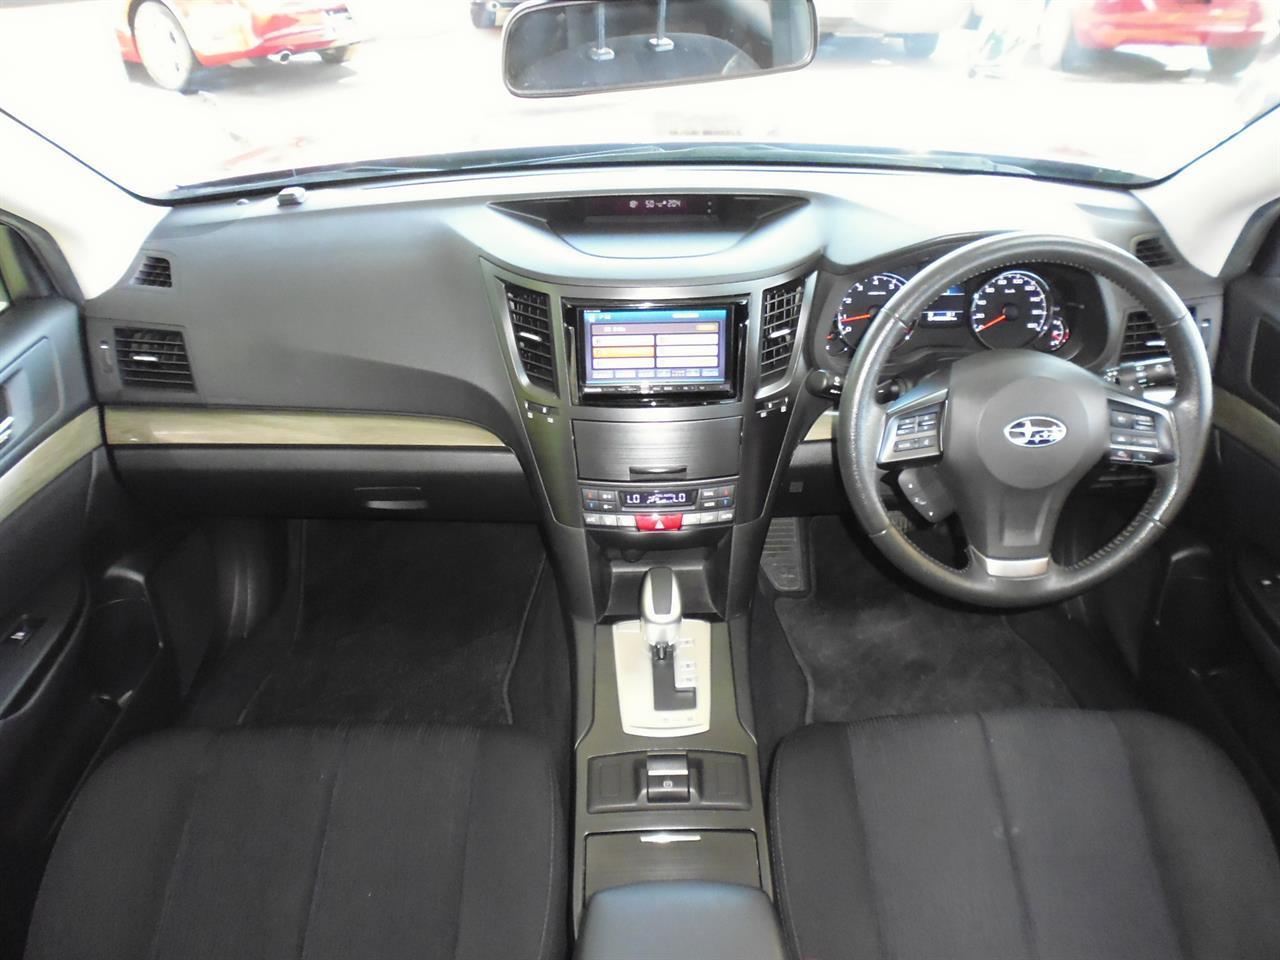 image-12, 2012 Subaru Outback 2.5i Eyesight at Christchurch